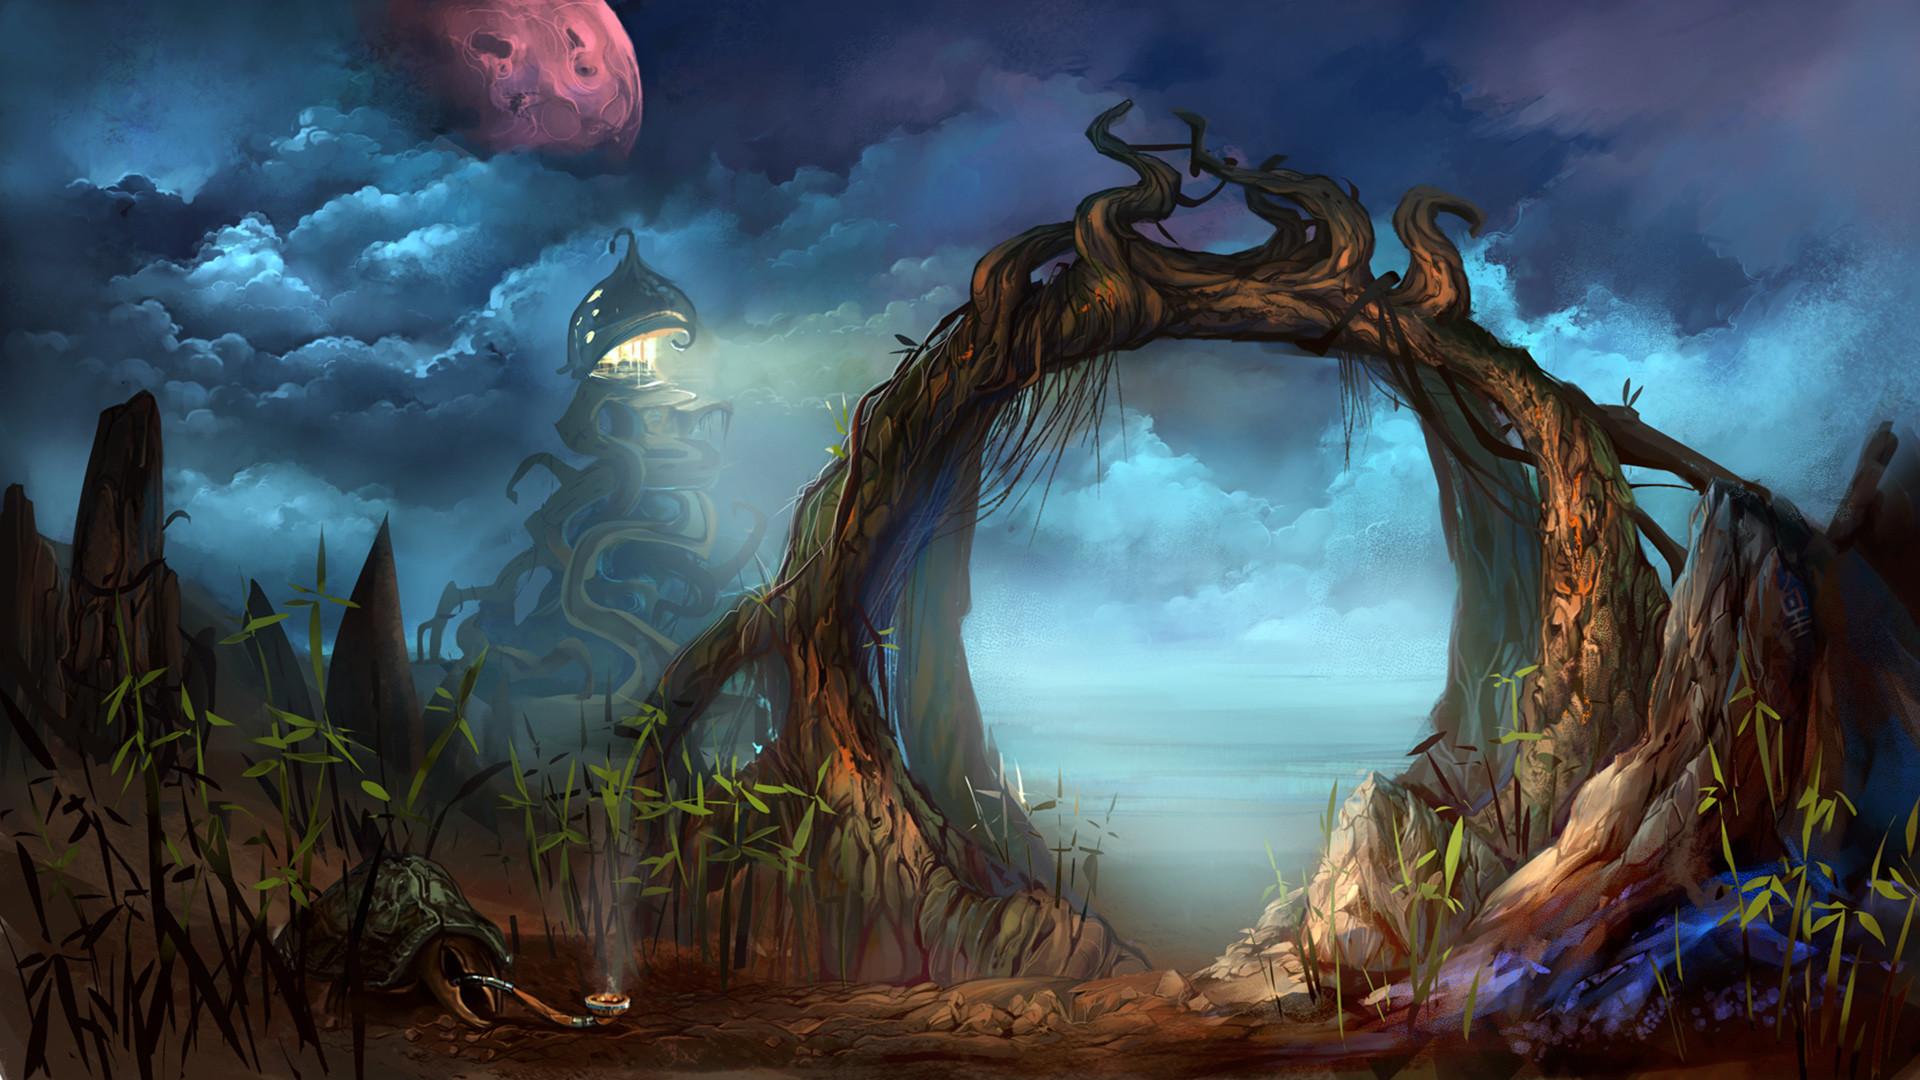 Video Game The Elder Scrolls III: Morrowind Wallpaper